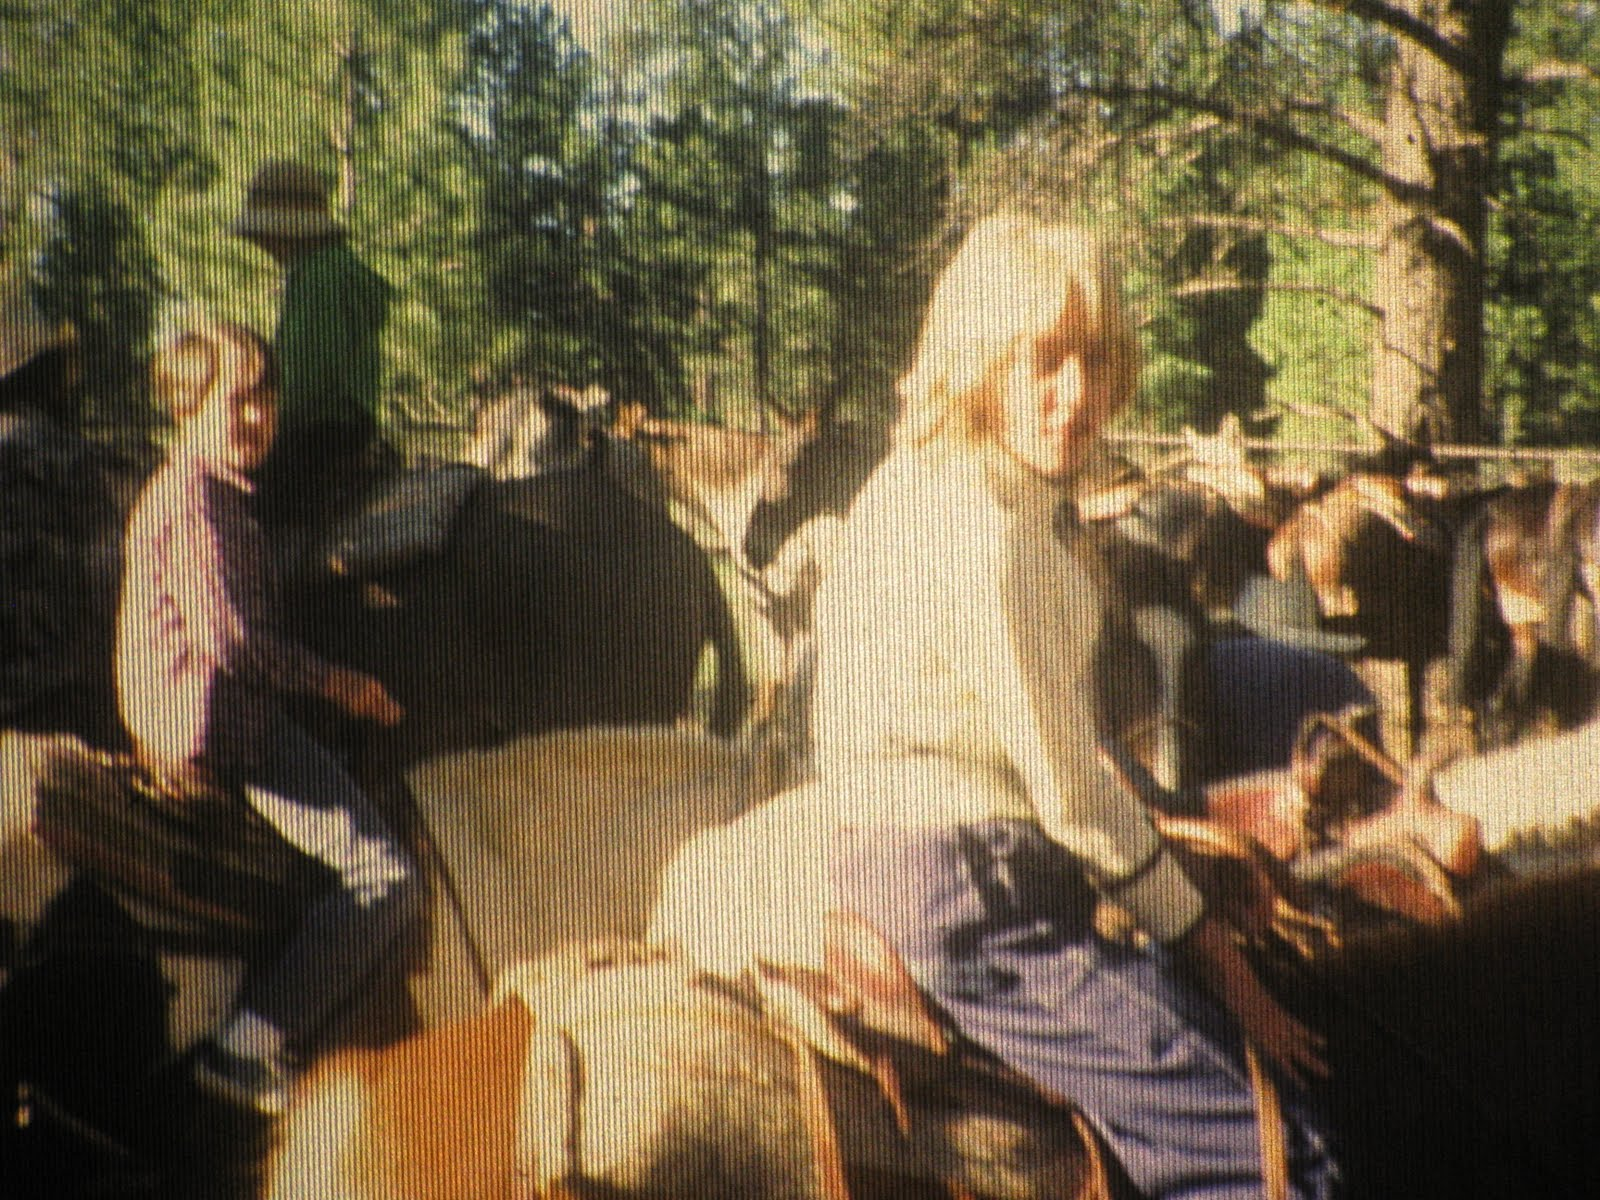 Wulff S Blog 1970s Family Life